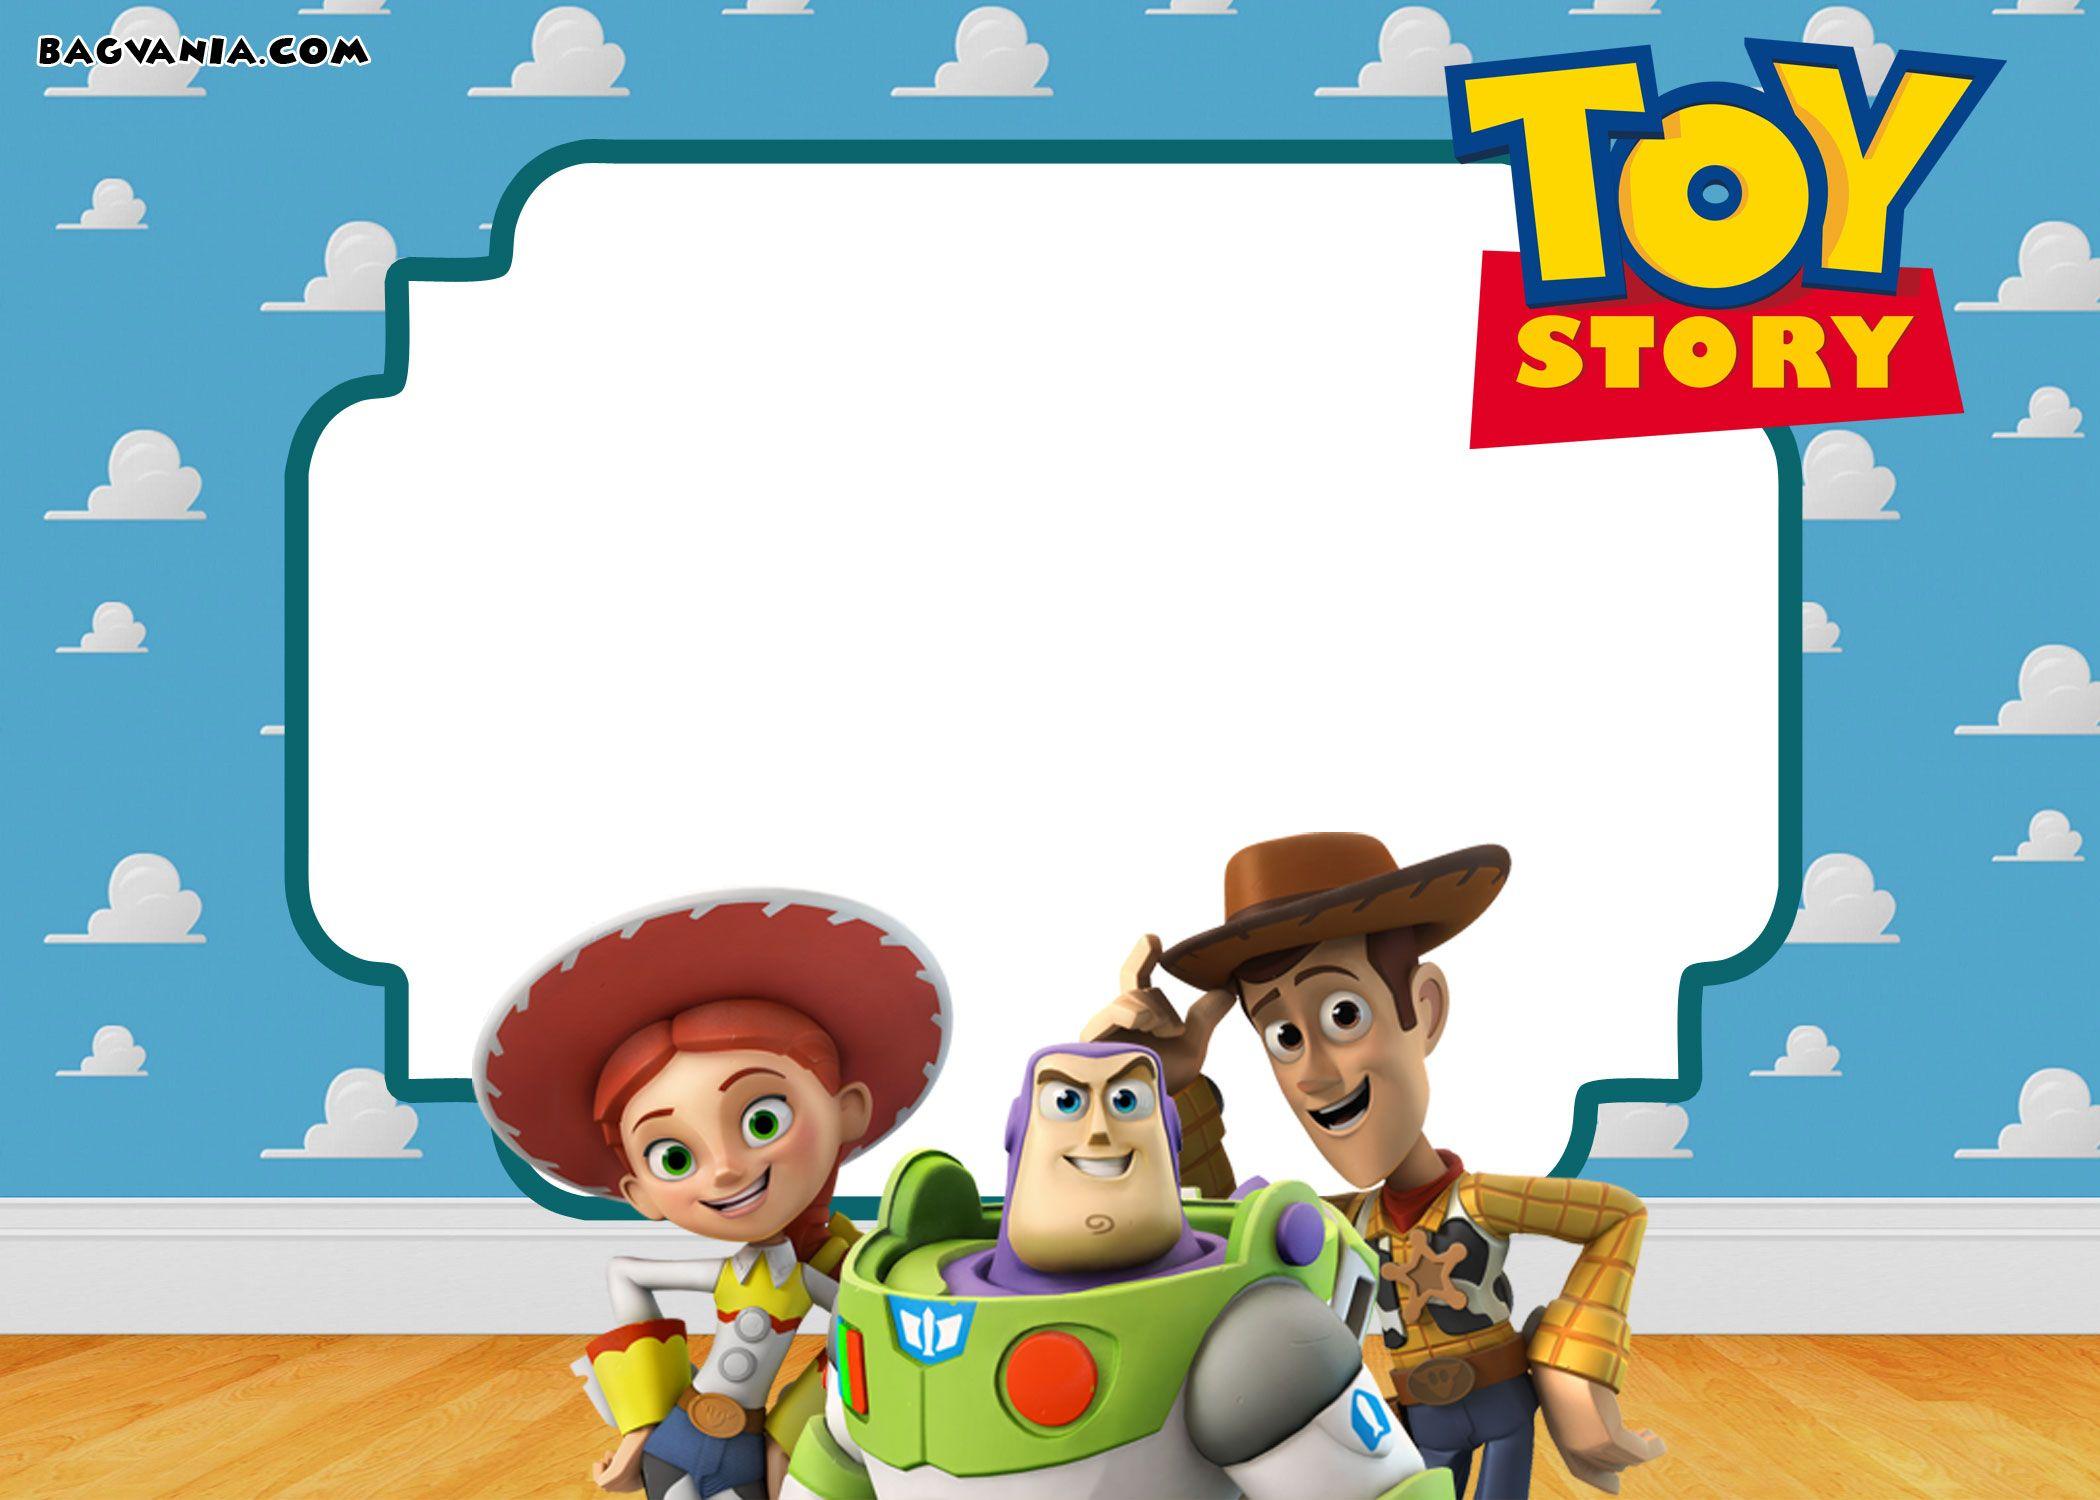 Free Printable Toy Story 3 Birthday Invitations | Free Printable - Free Printable Toy Story 3 Birthday Invitations